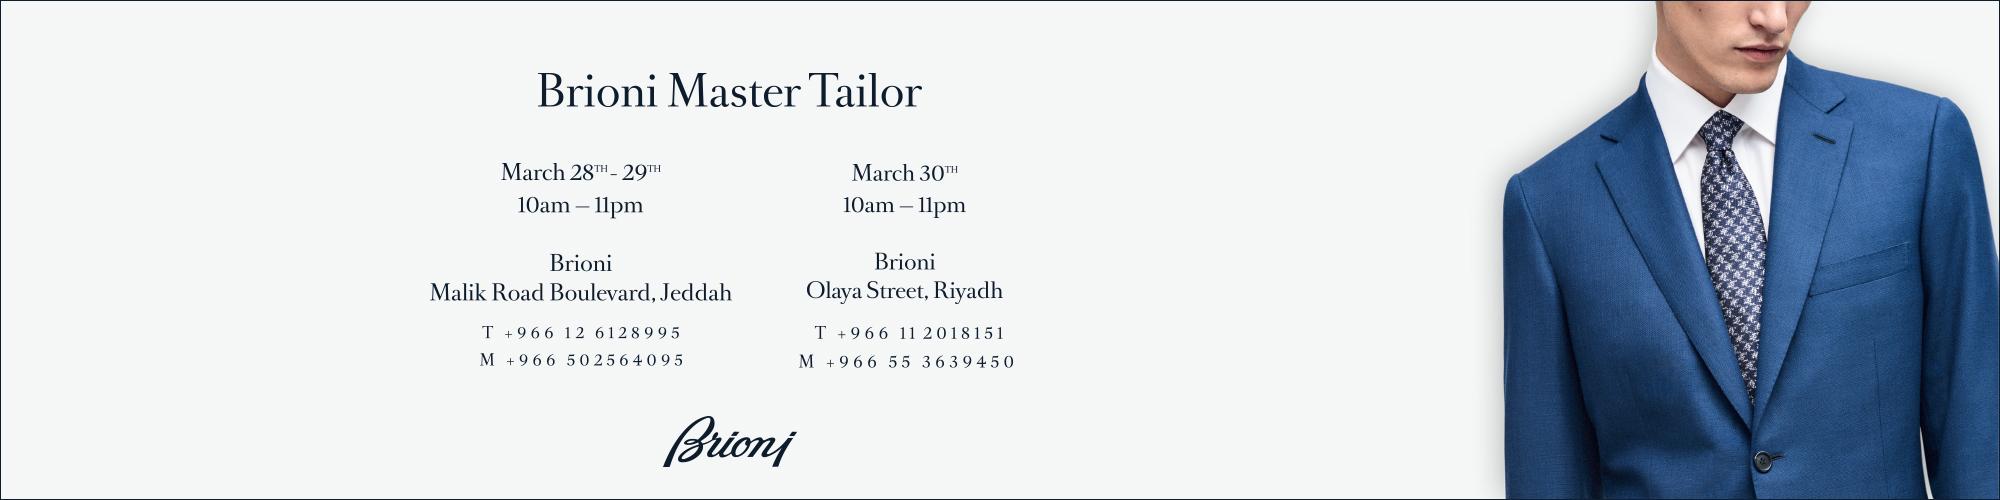 Brioni-MTM-banner